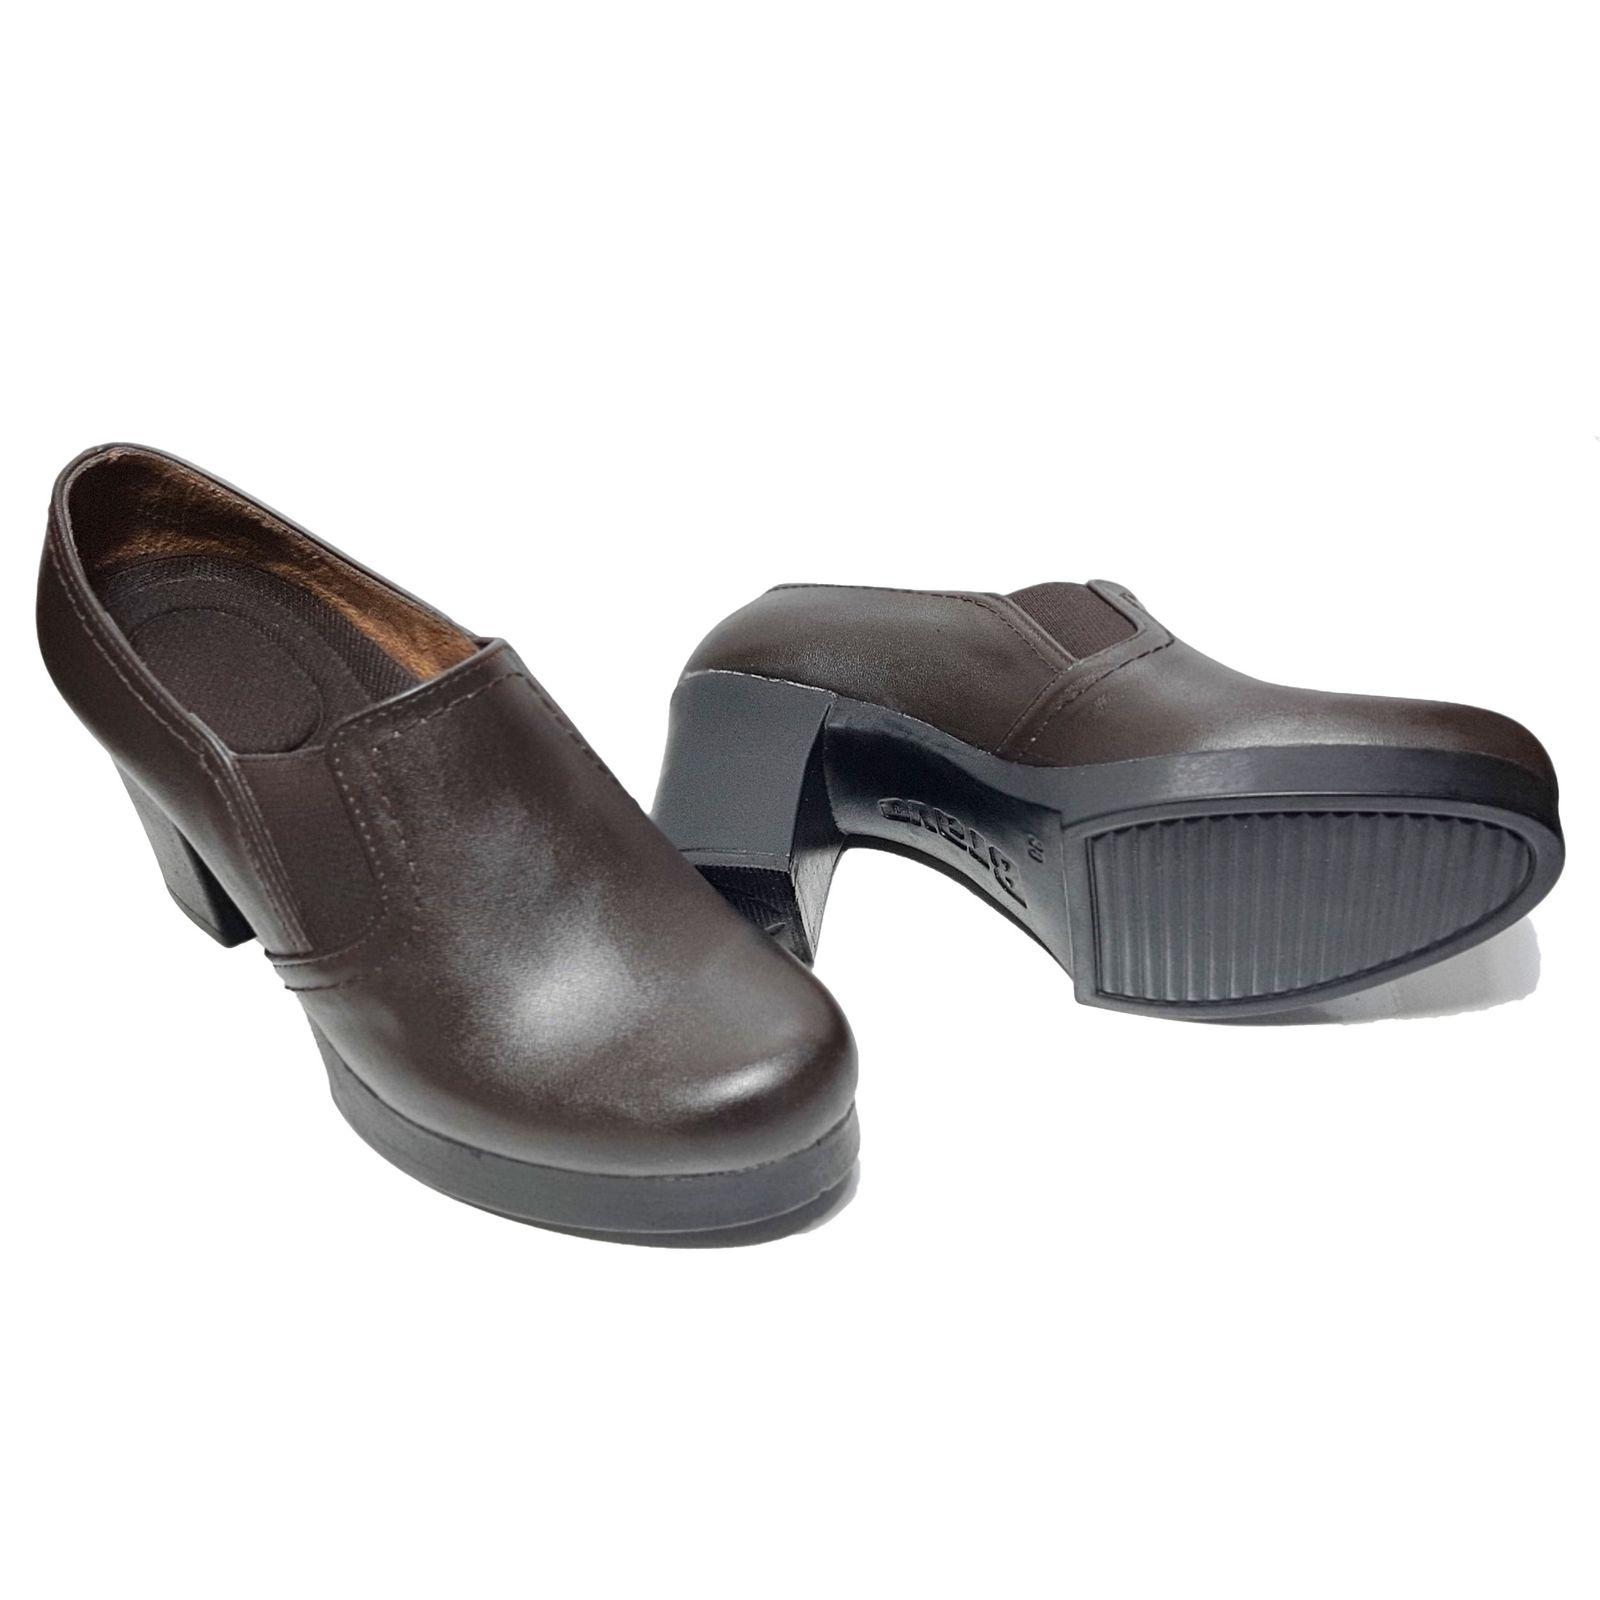 کفش زنانه مدل پرنس -  - 5